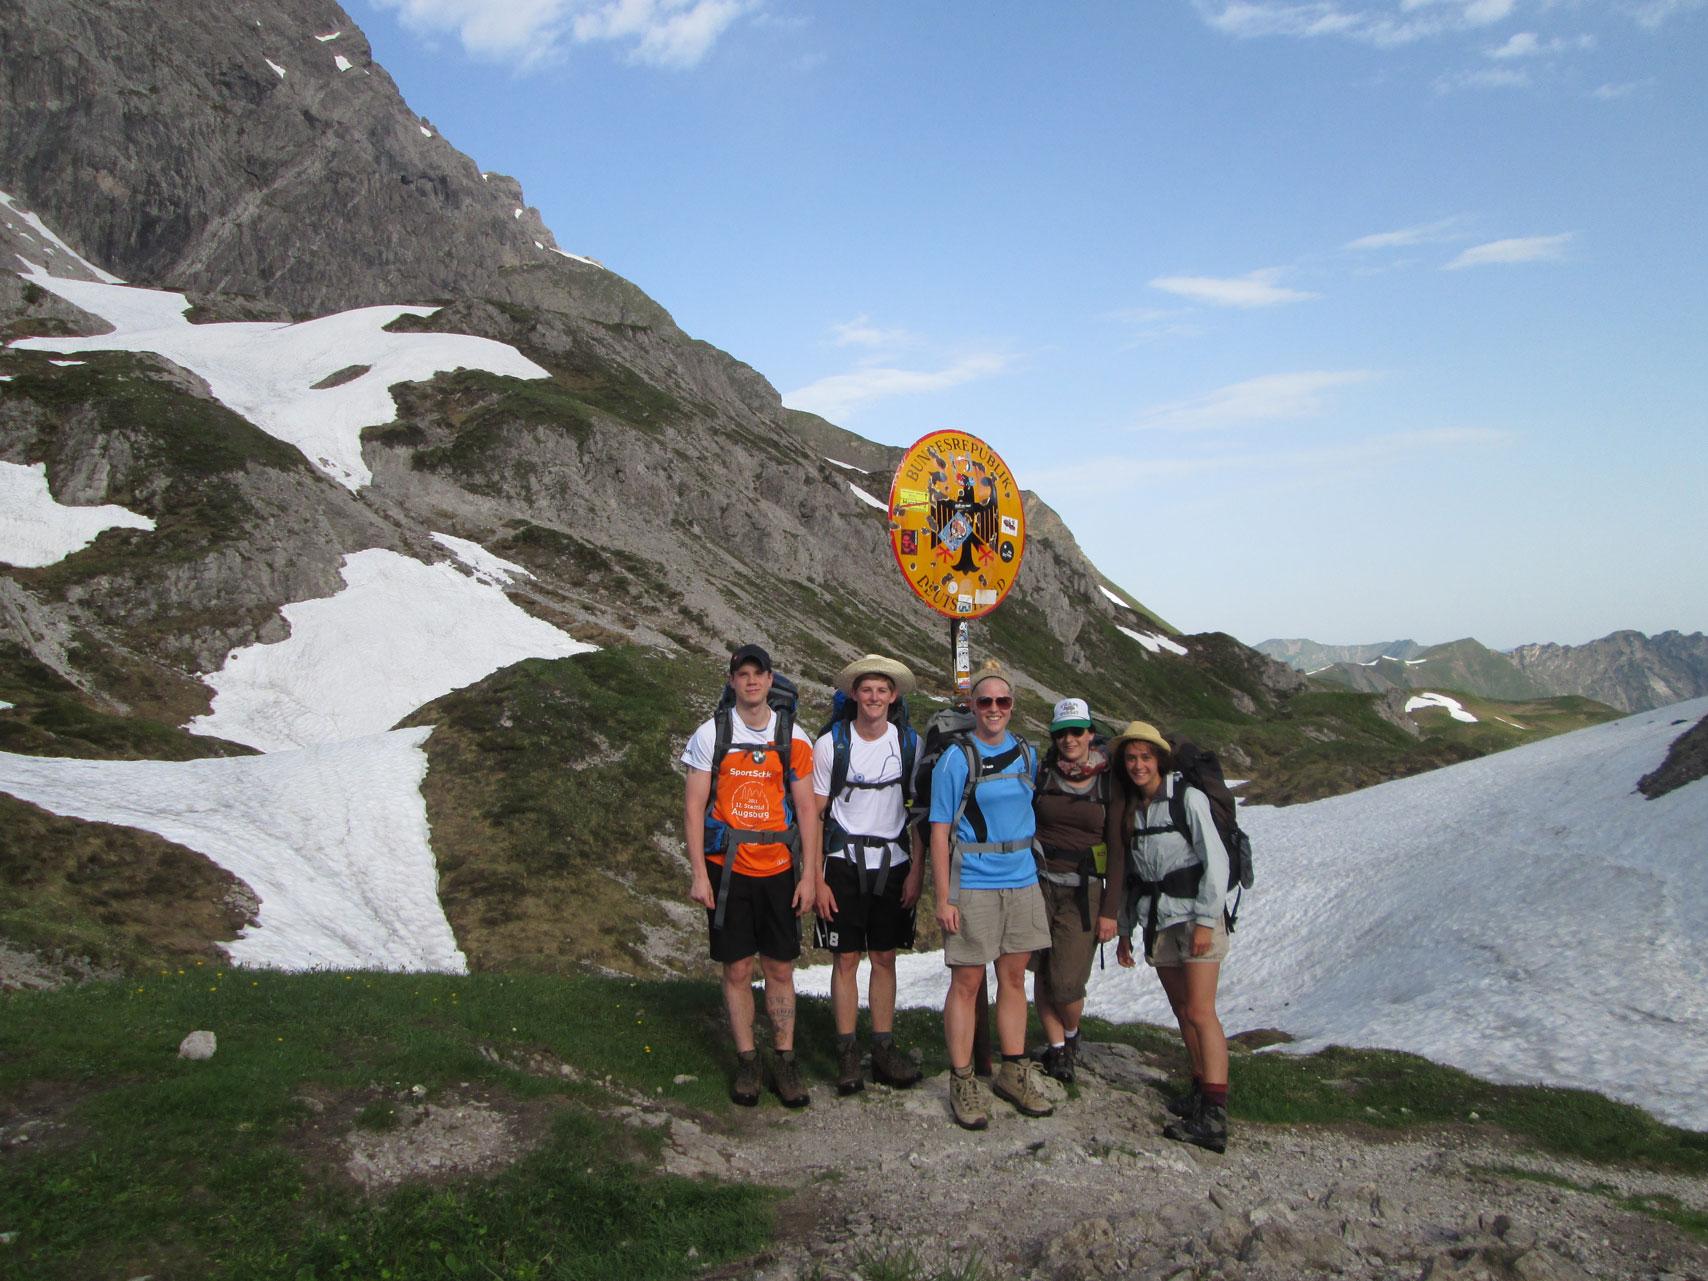 anna-grillmaier-munichmountaingirls-sommer-berge-wandern-e5-fernwanderweg-europa